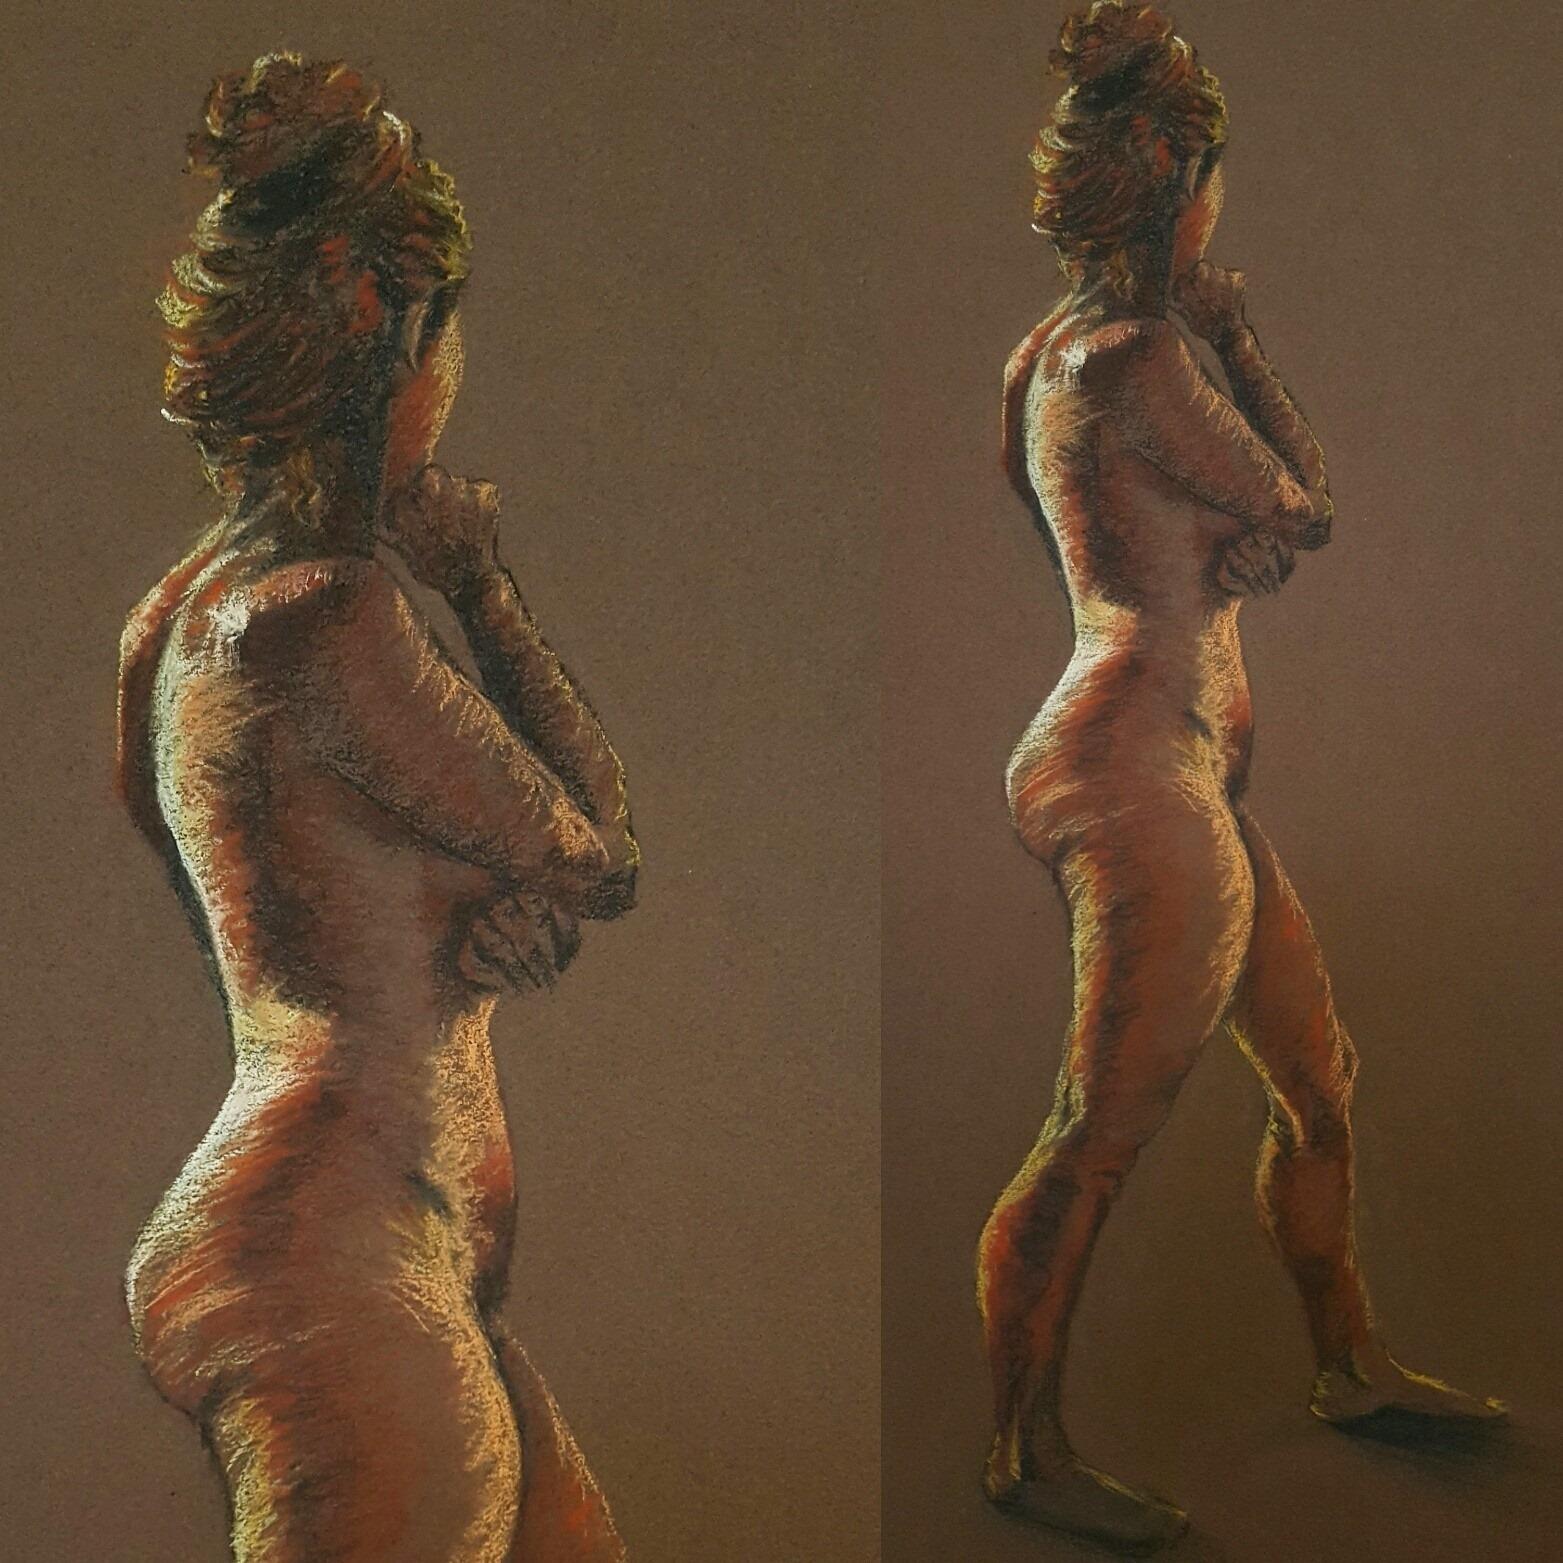 Sculpture 5 week pose